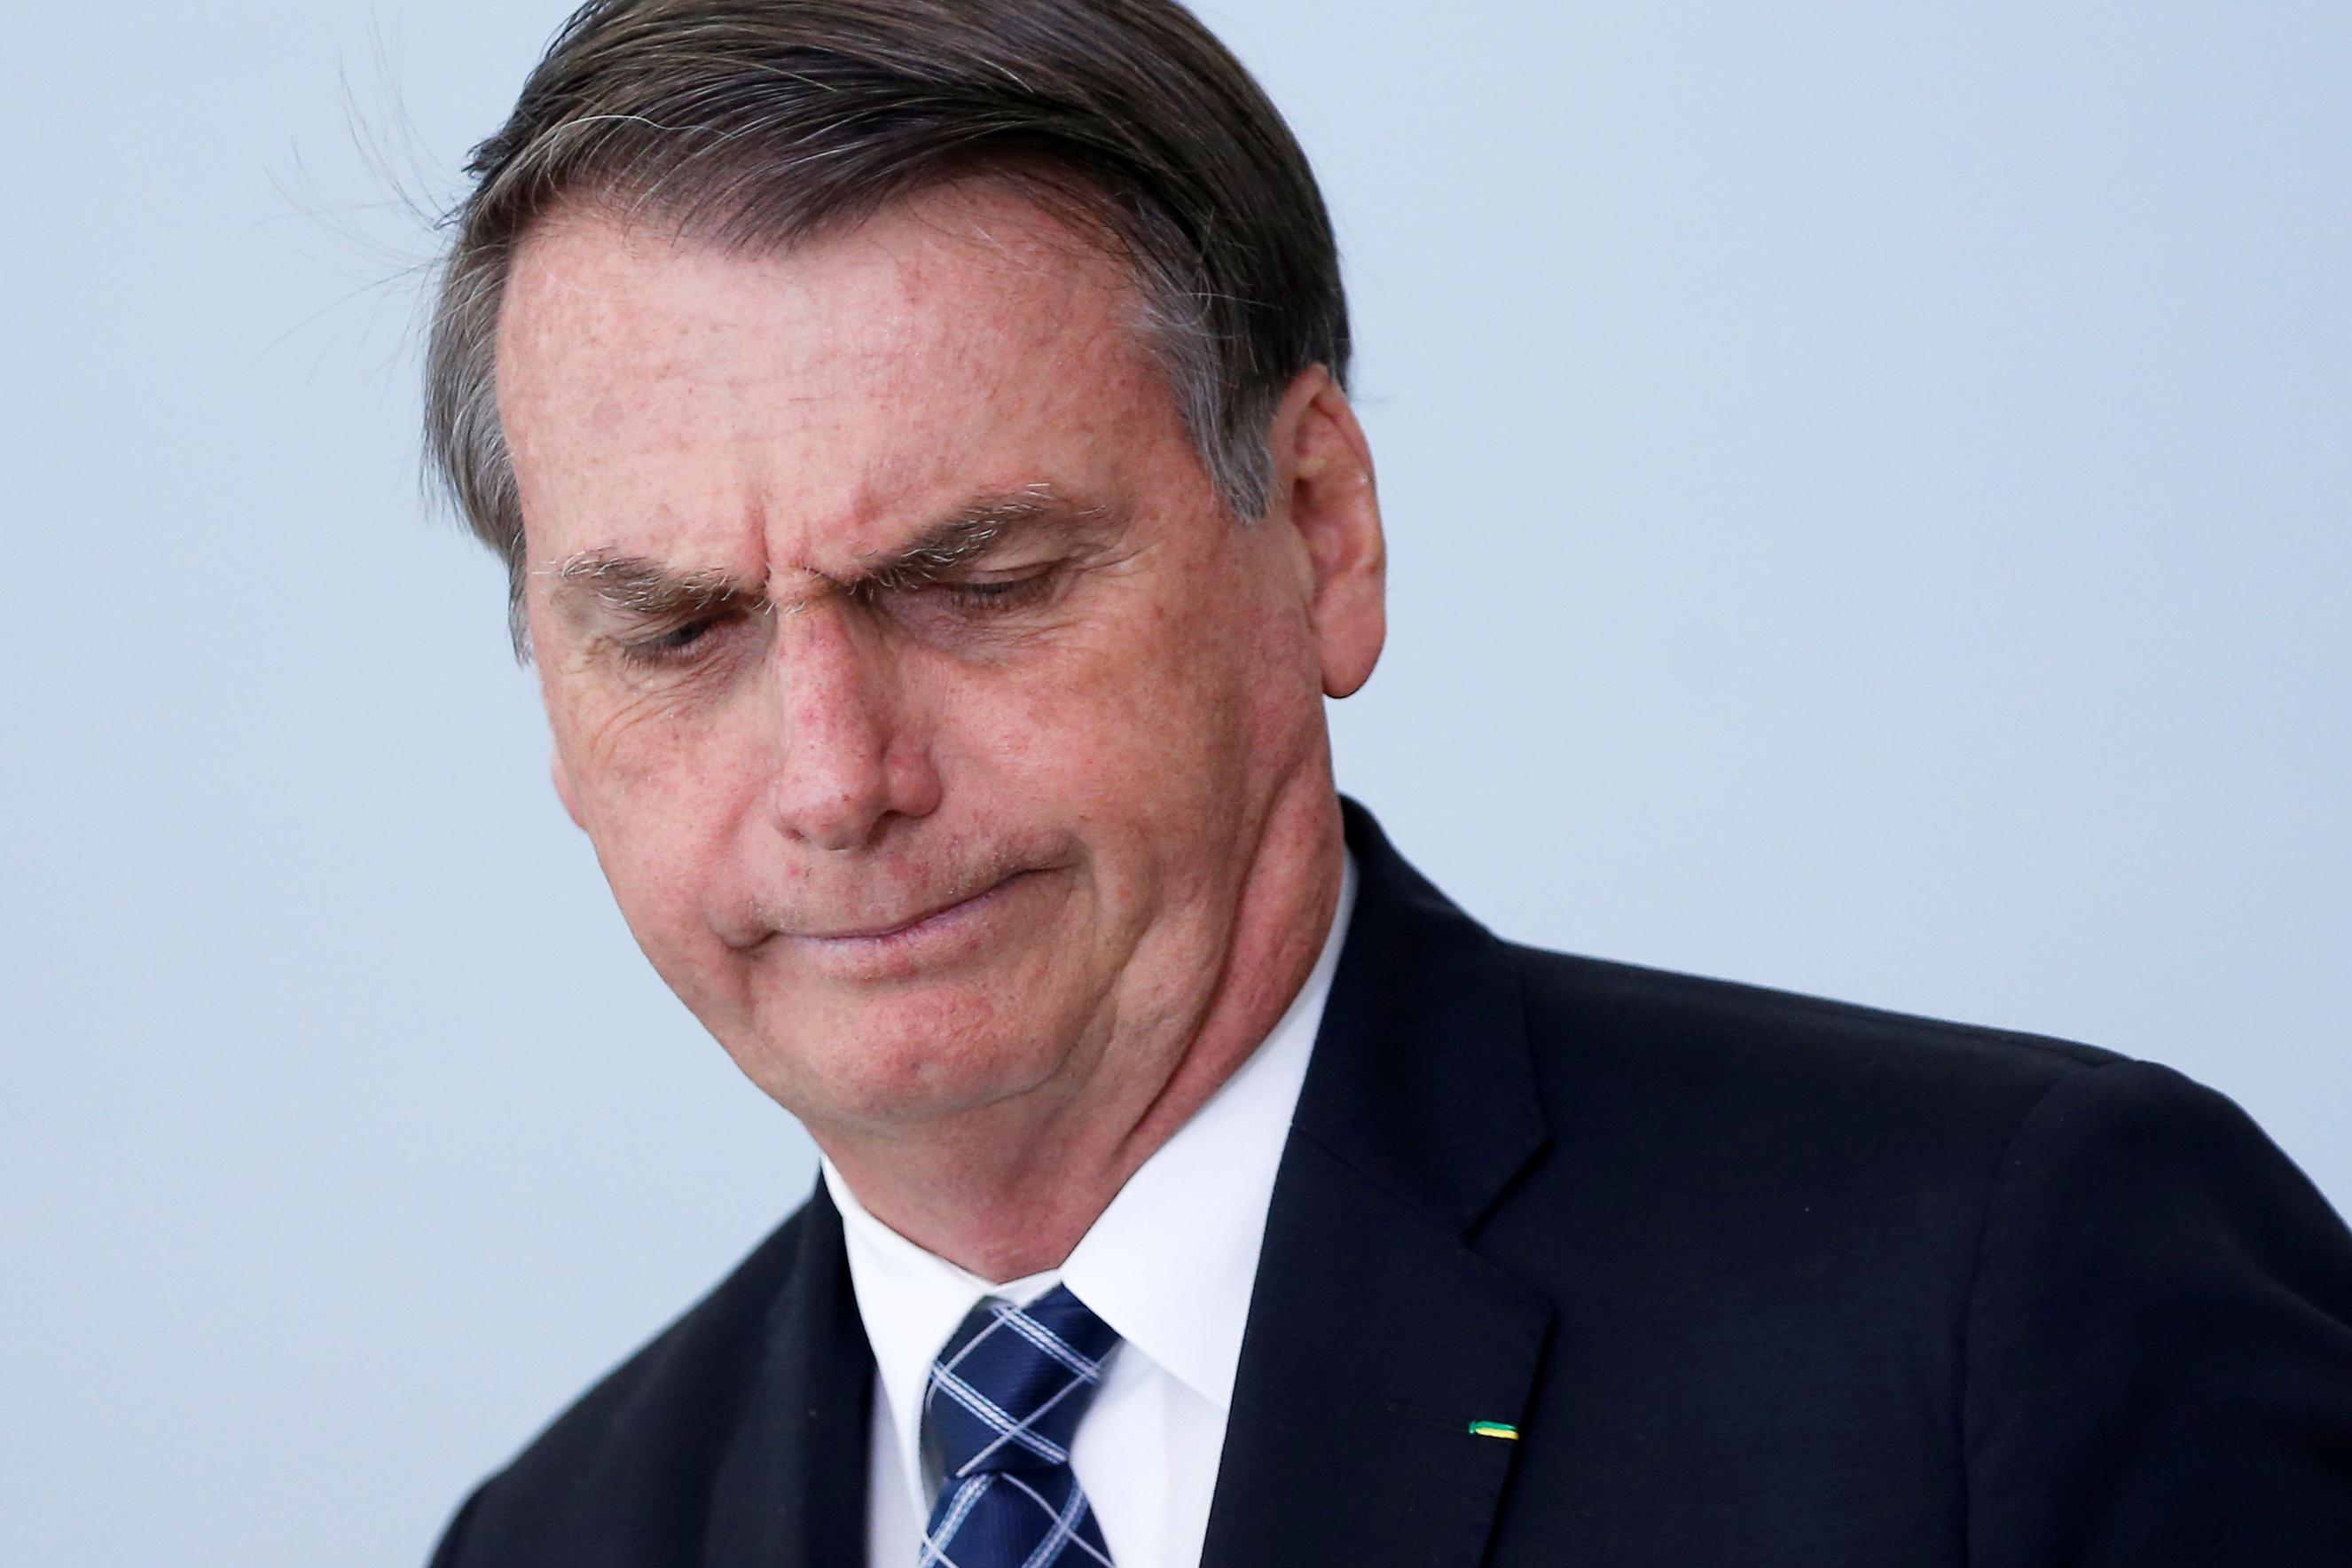 Brazil's Bolsonaro extols convicted torturer as a 'national hero'